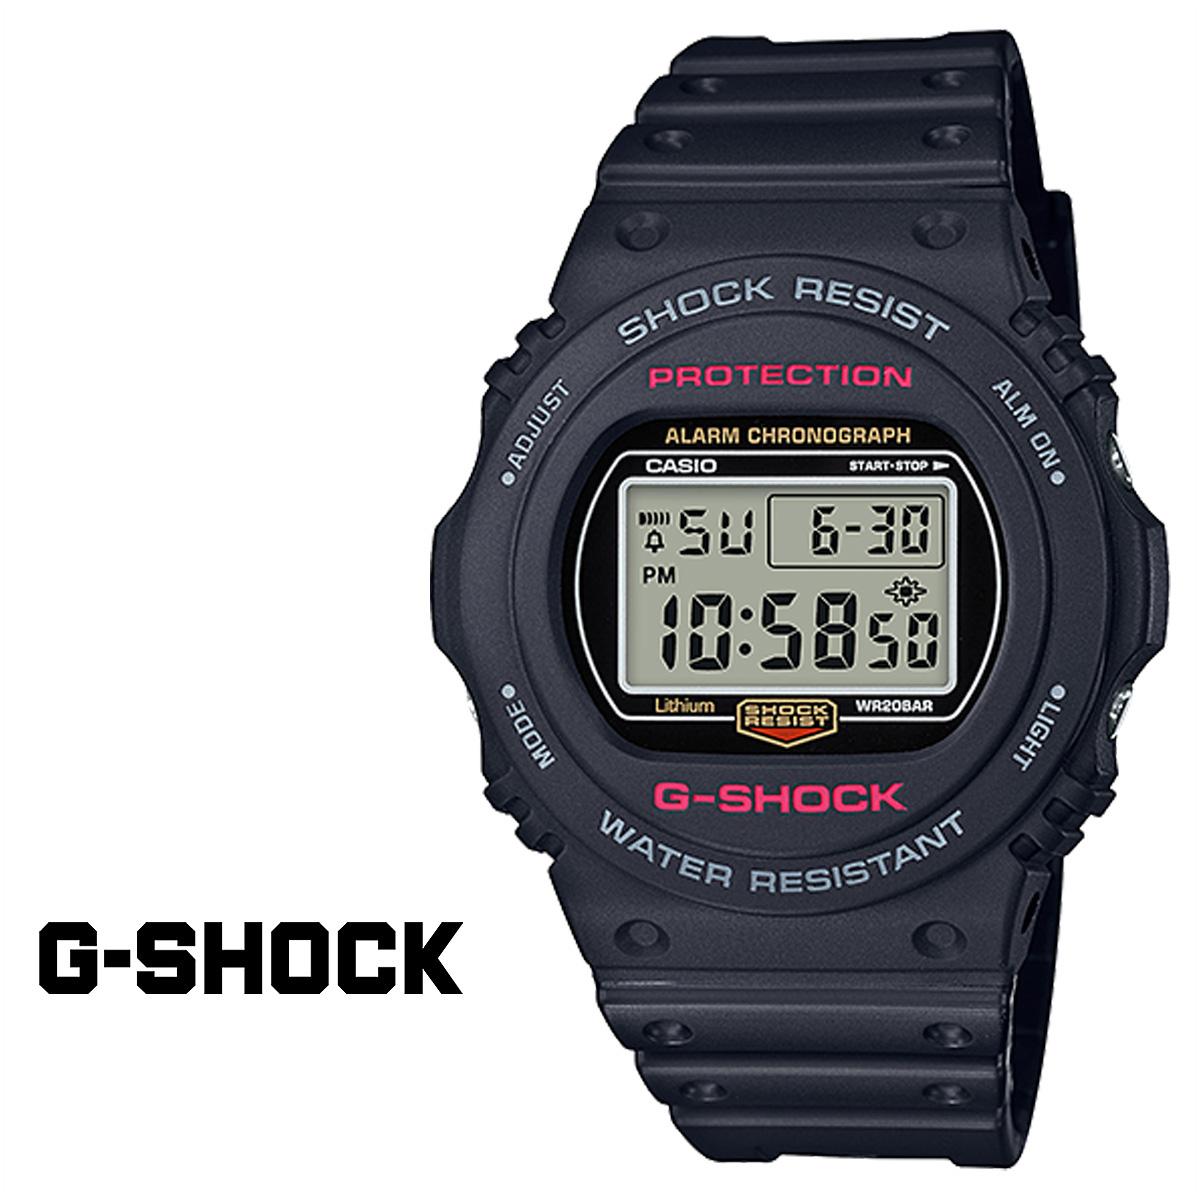 d4af48f8525 Sugar Online Shop  CASIO Casio G-SHOCK watch DW-5750E-1JF G-Shock G ...